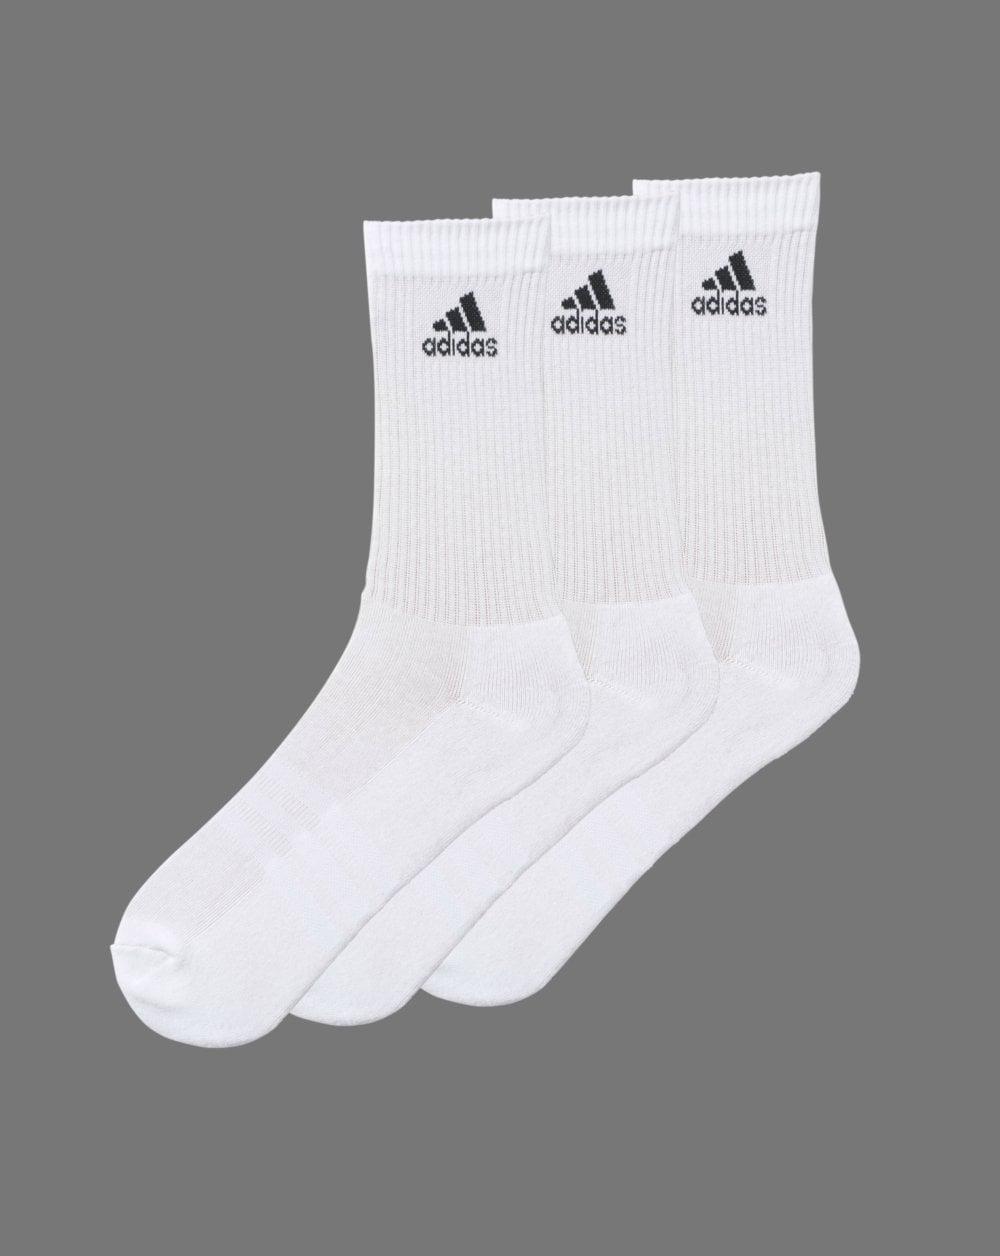 Adidas Originals 3 Pack Stripe Socks